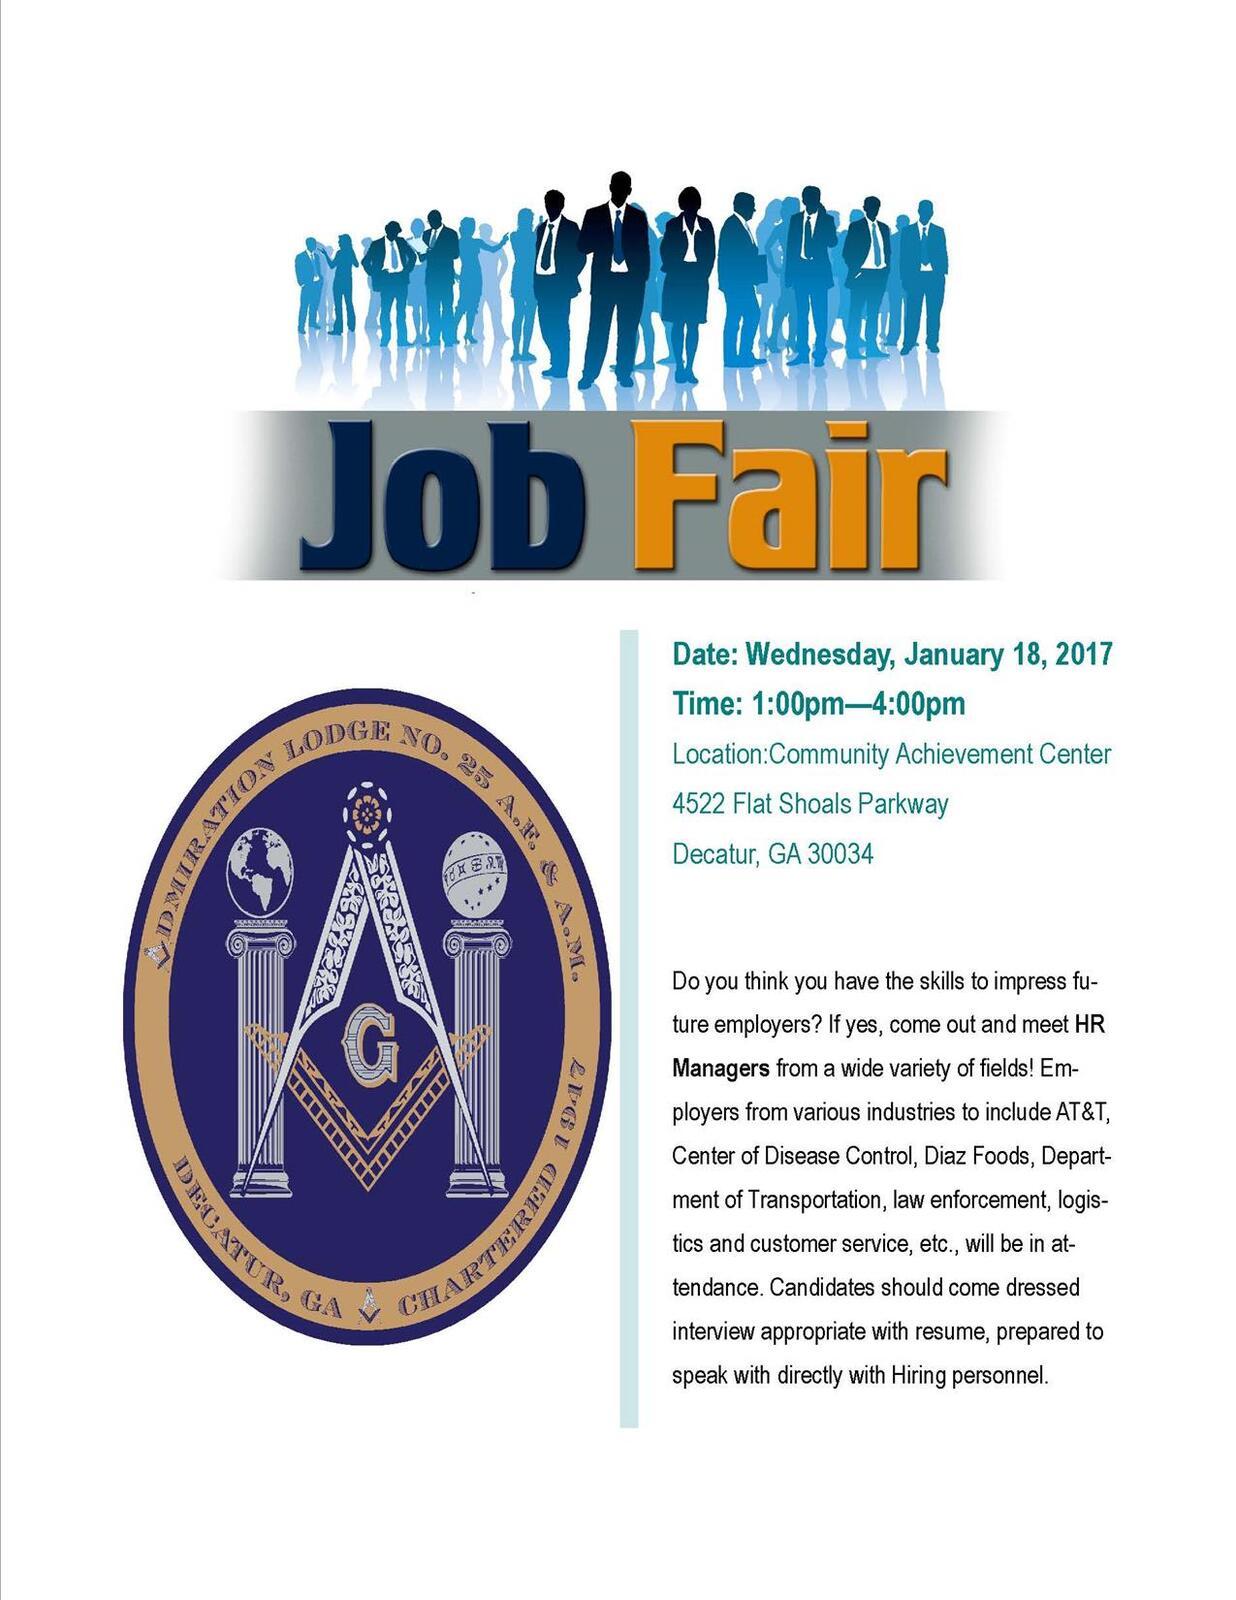 ADMIRATION LODGE #25 JOB FAIR (DeKalb County Police